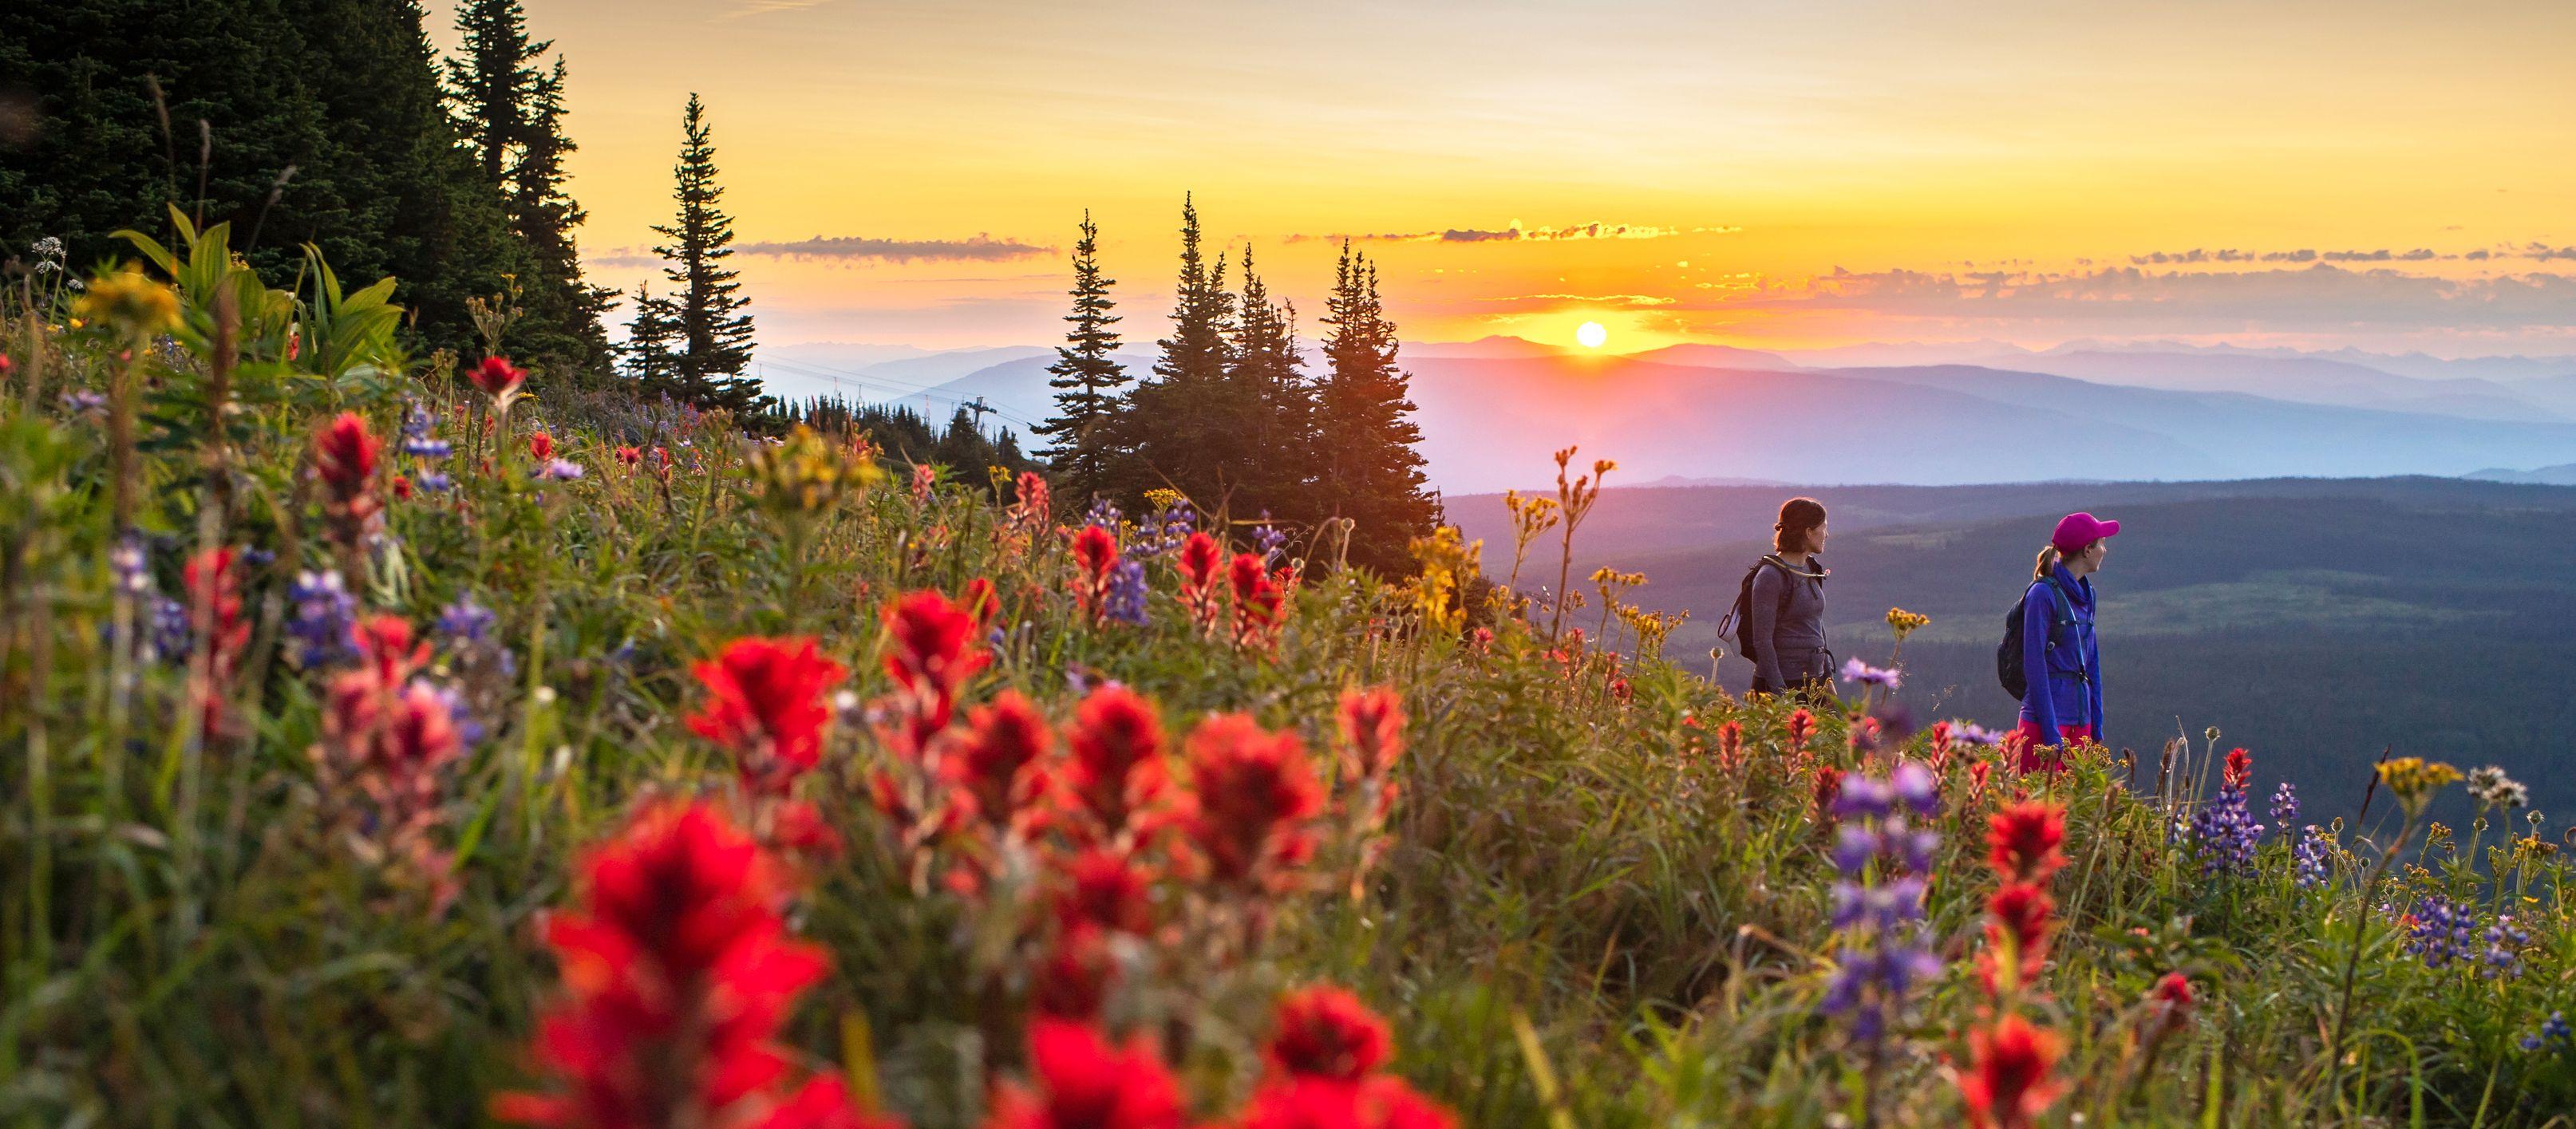 Sonnenuntergang über Sun Peaks, Britisch Kolumbien